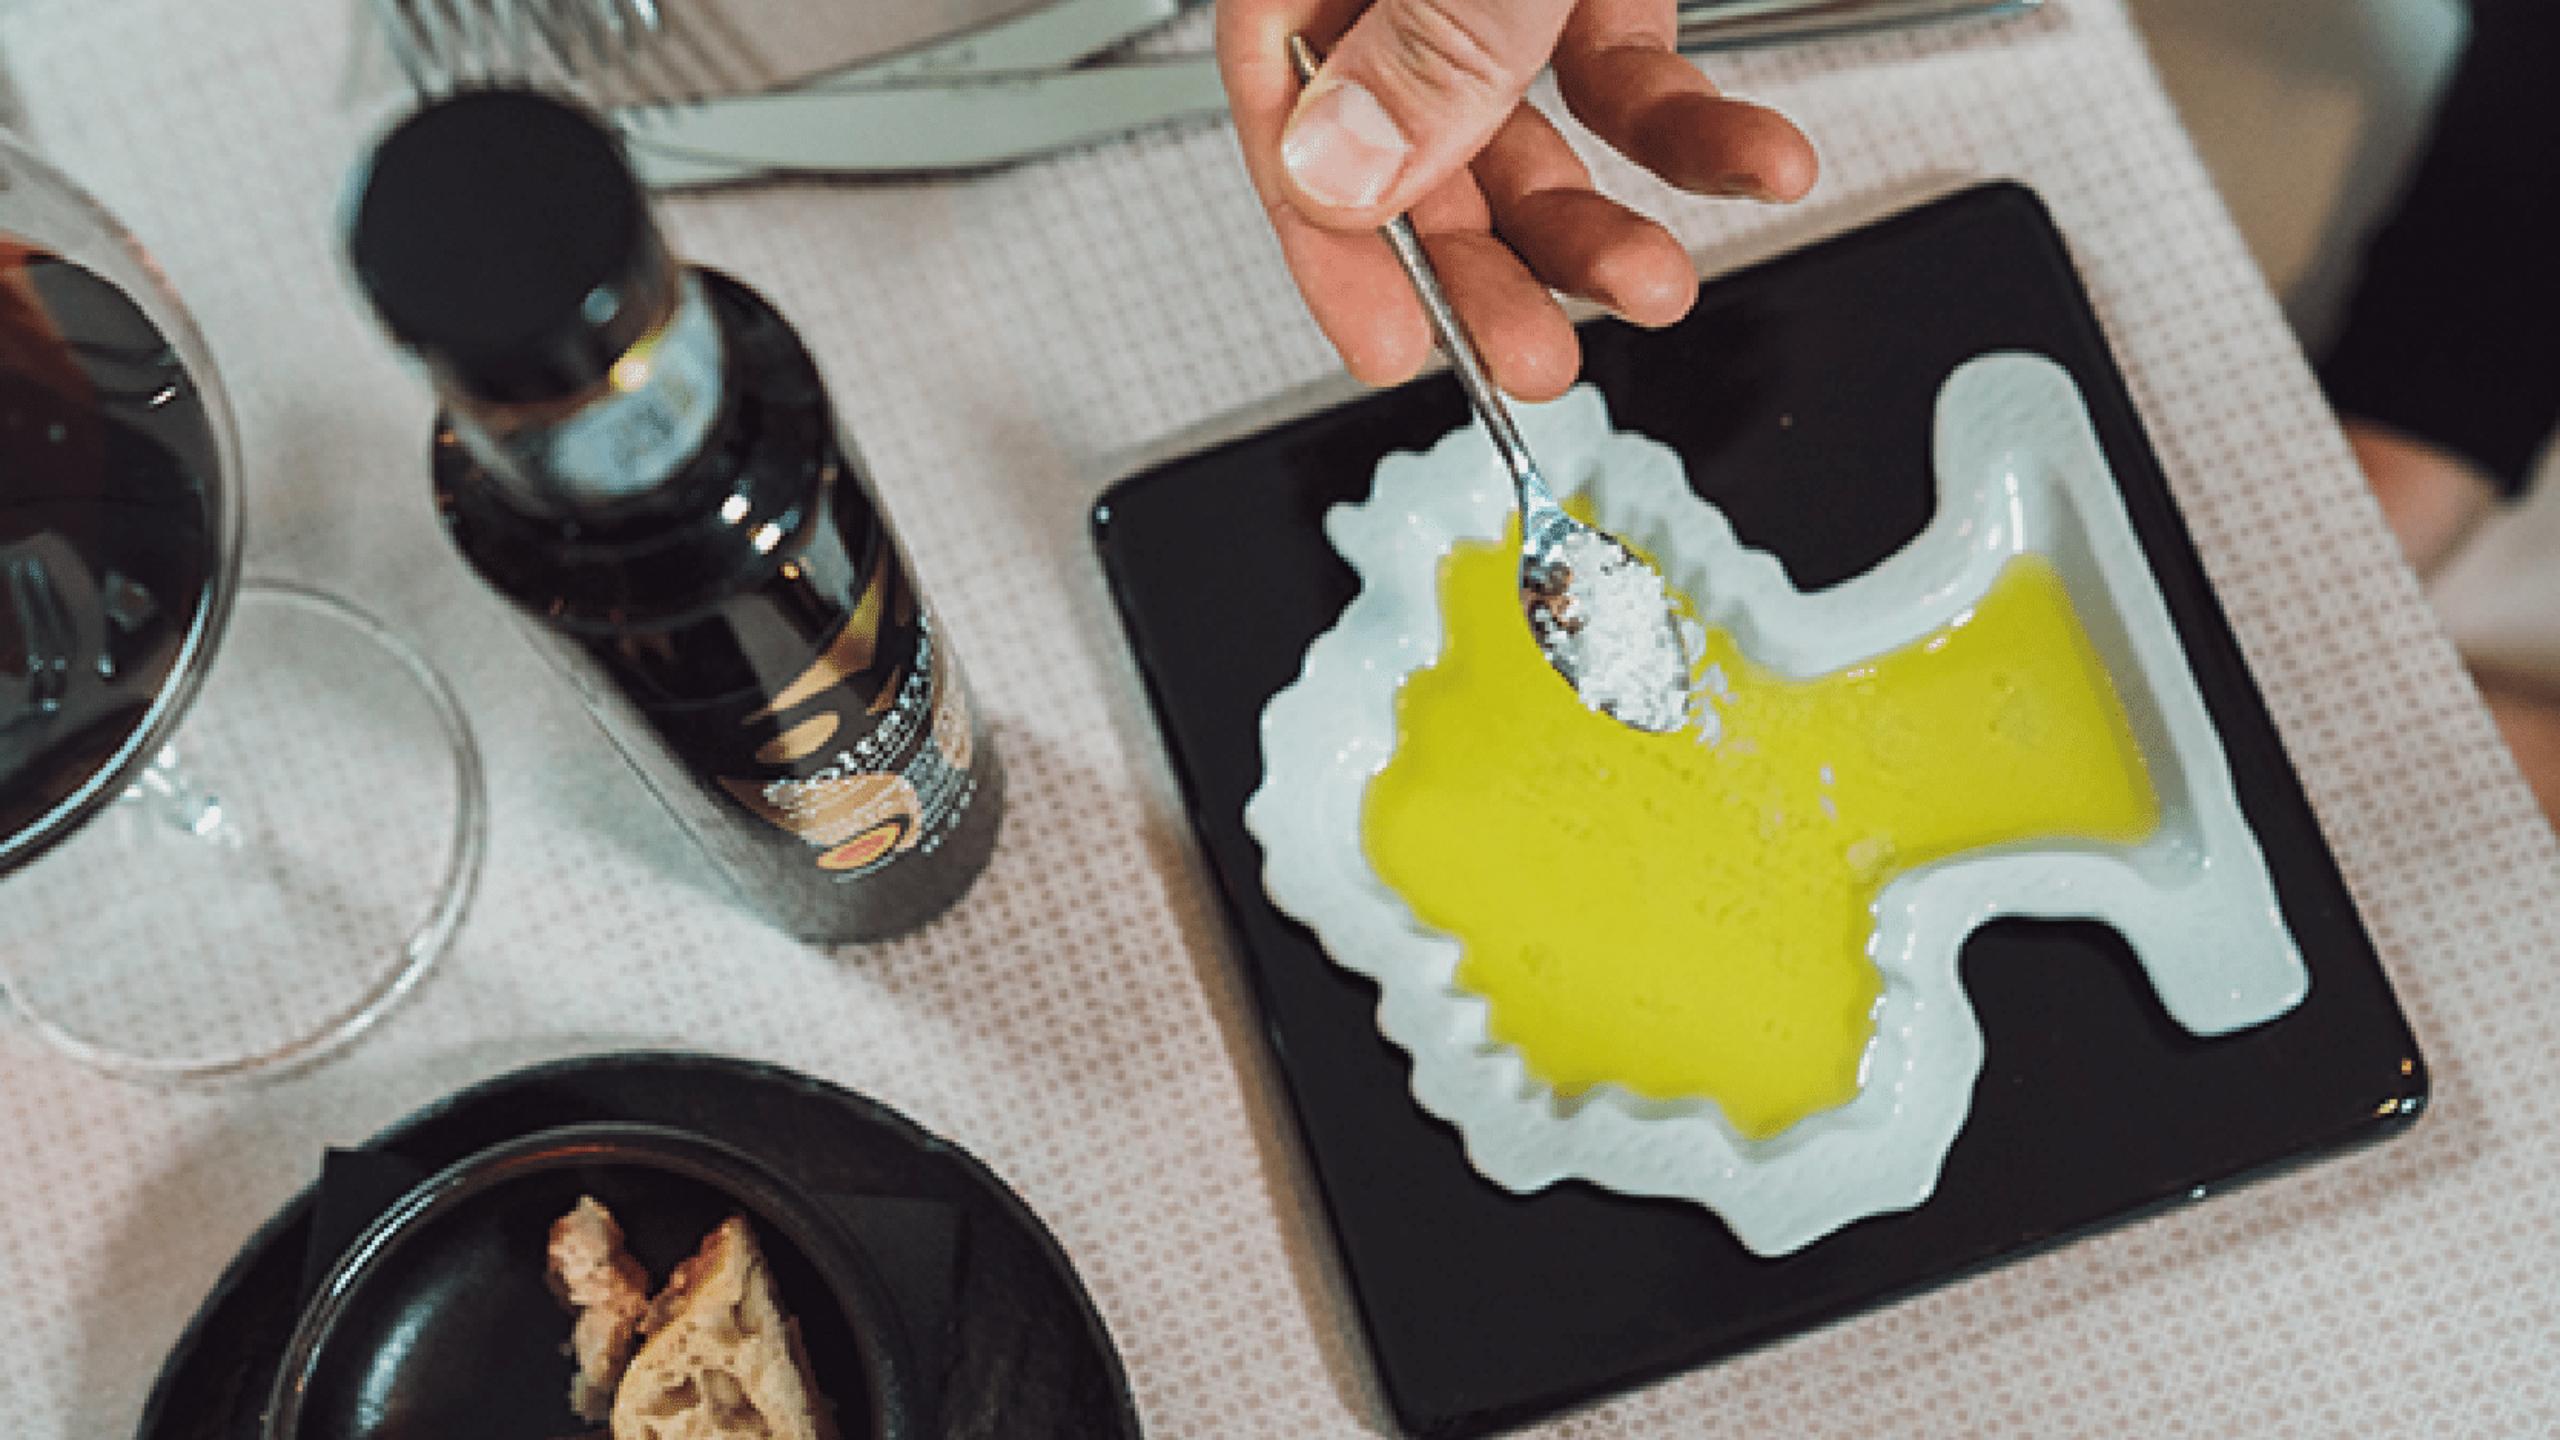 10 razloga zašto ŠMU, Šoltansko maslinovo ulje